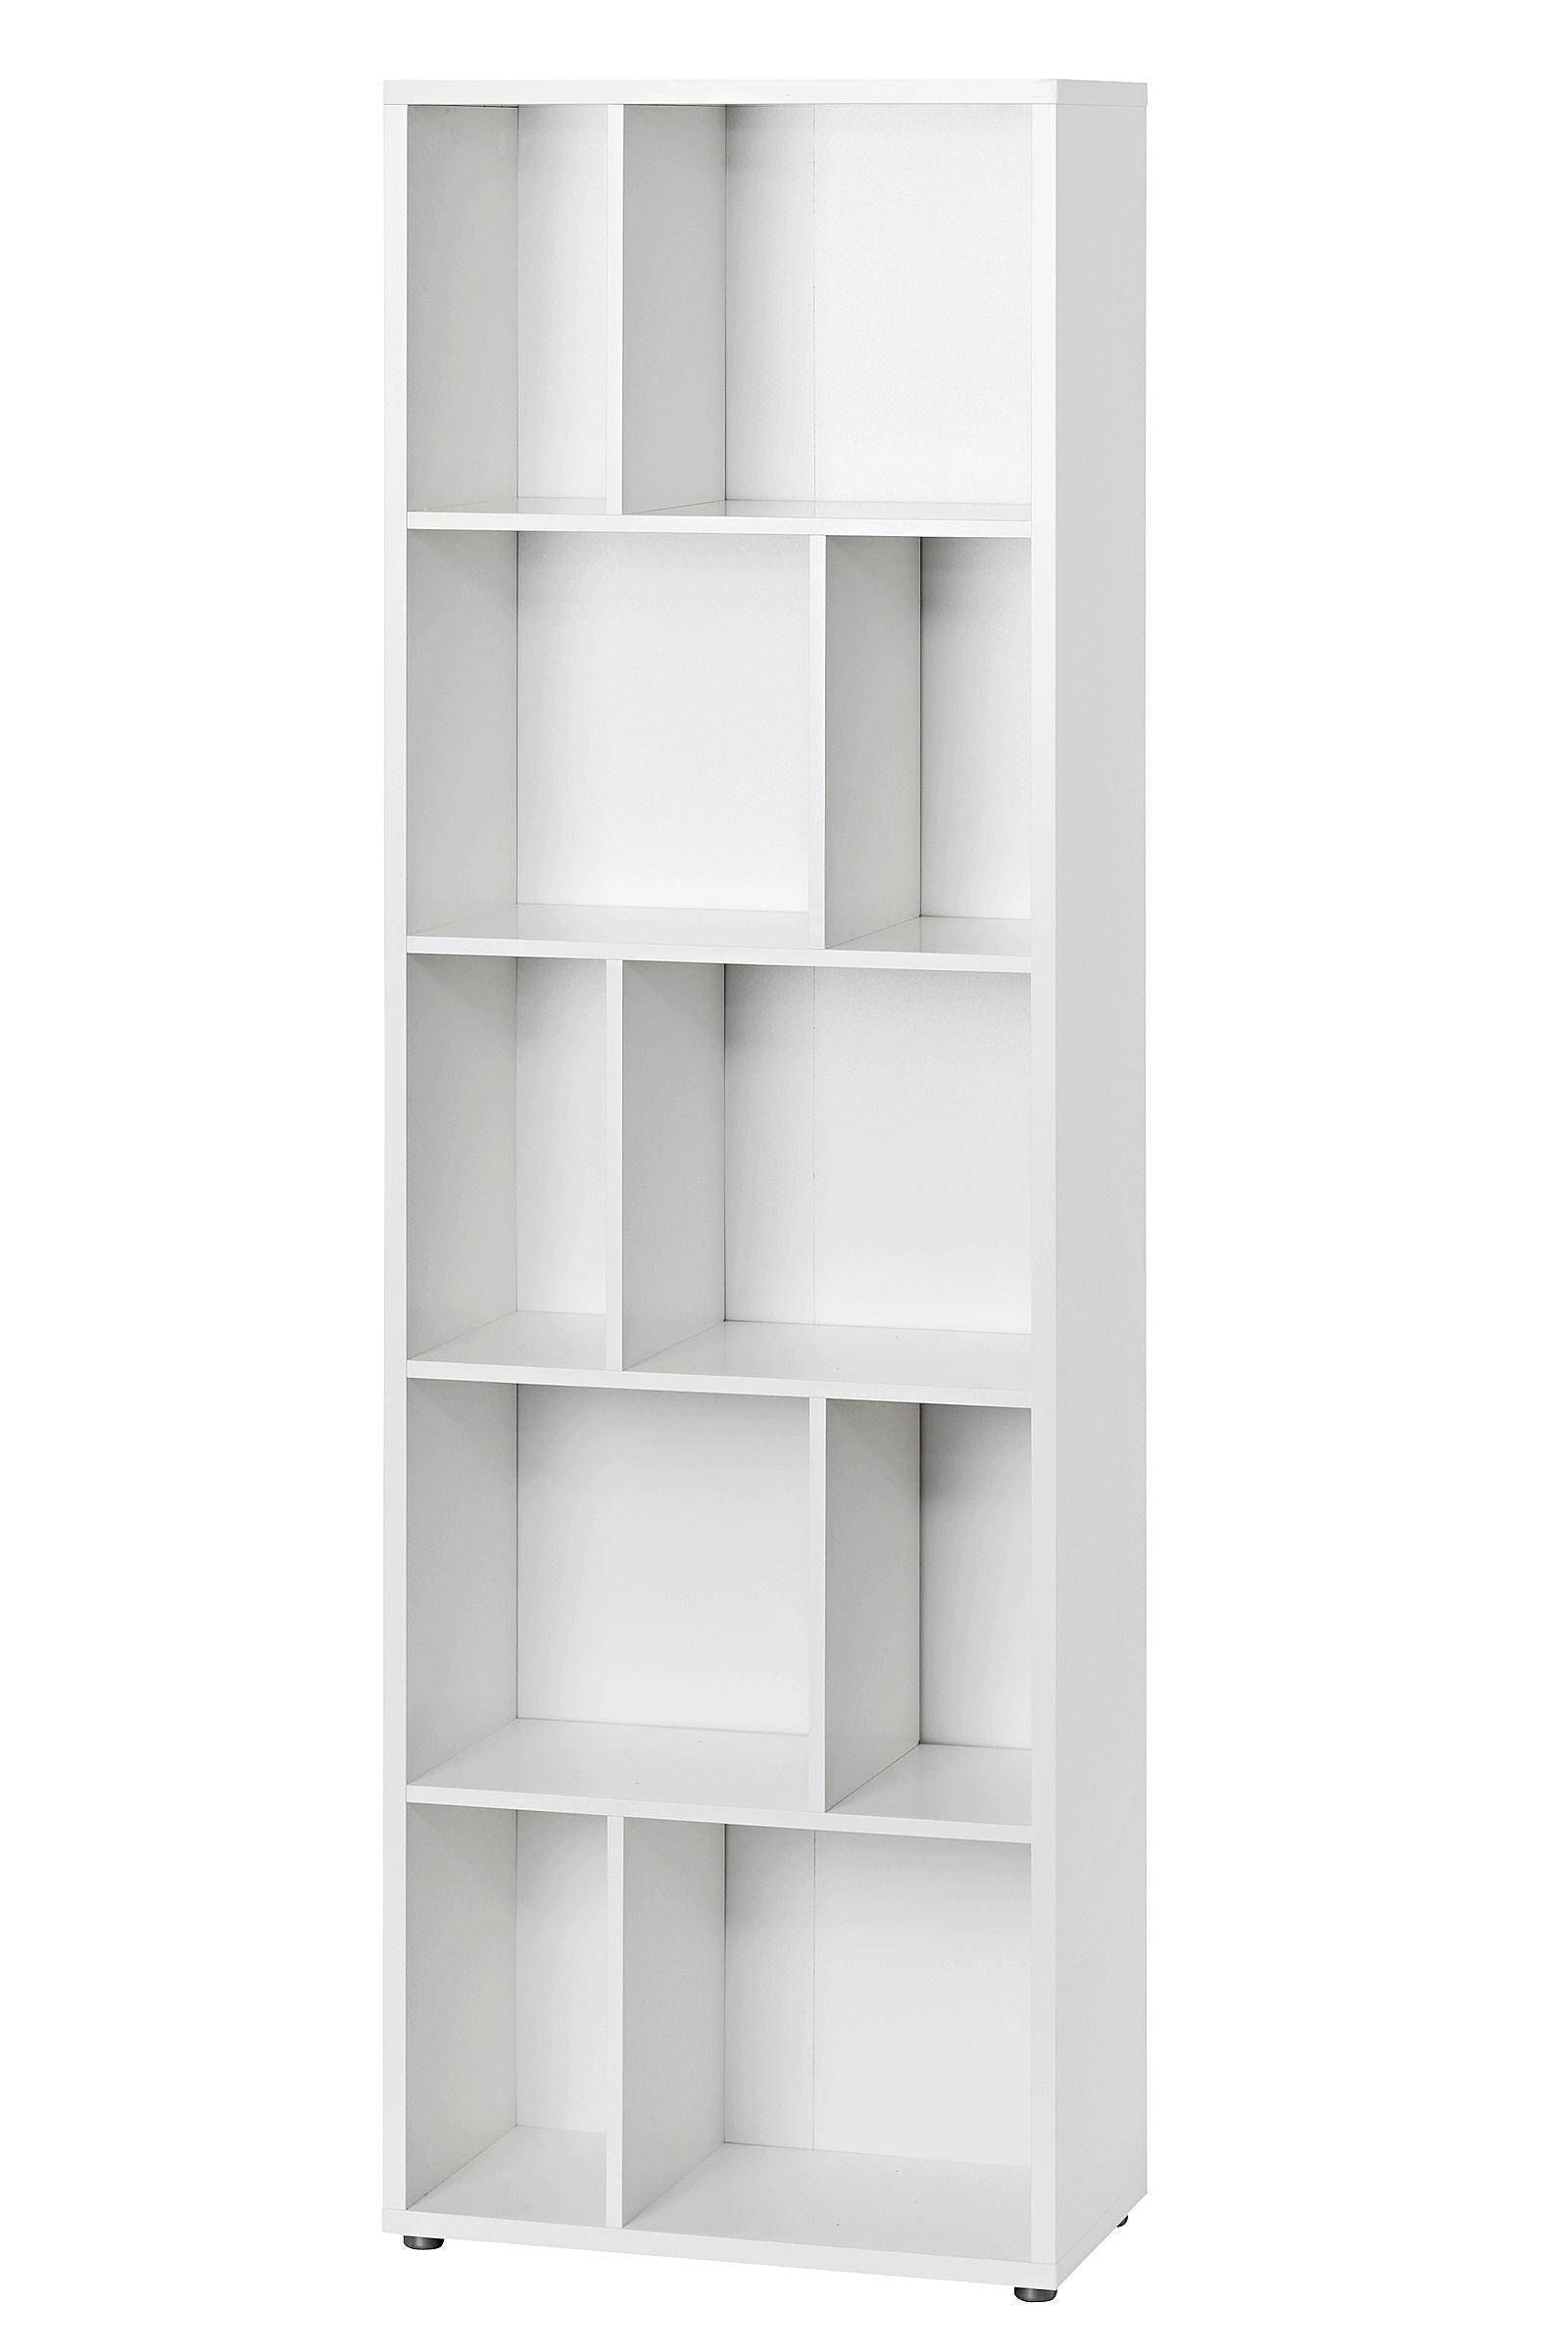 wehkampnl boekenkast maze wehkamp